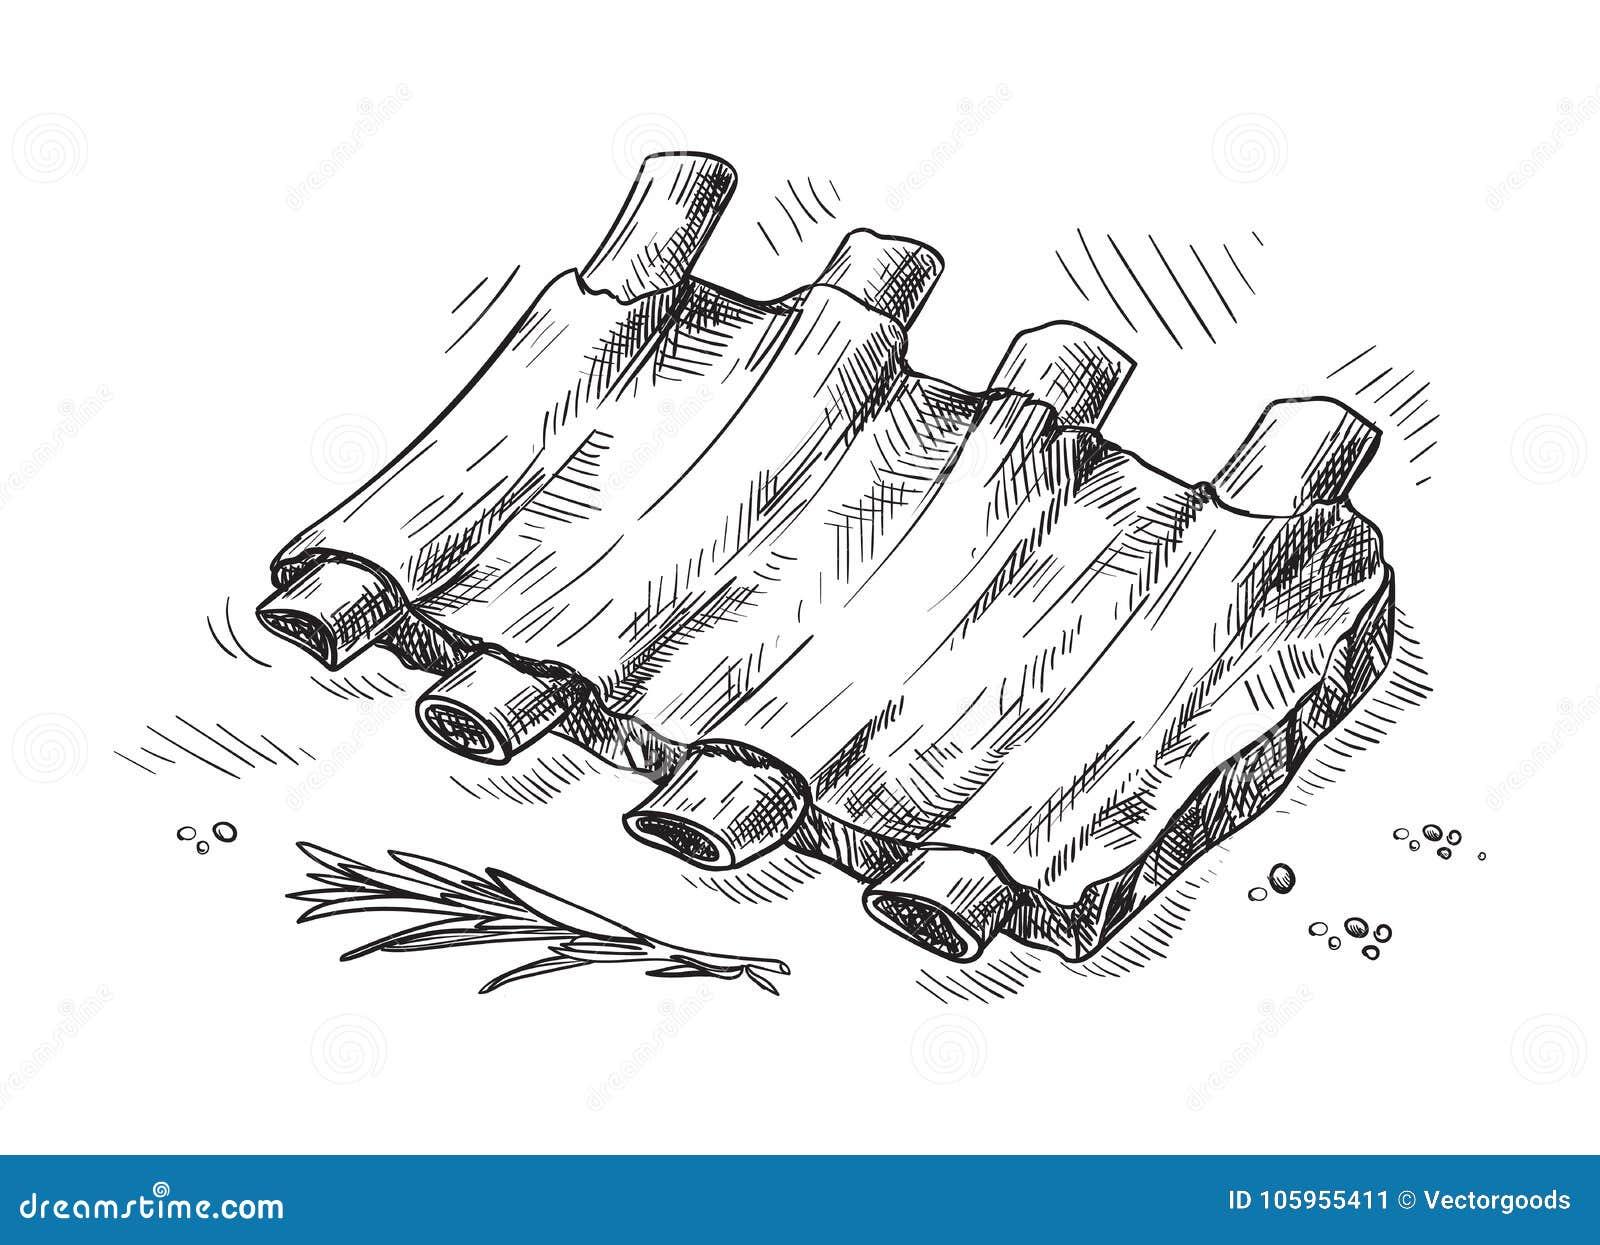 Pork Cartoons, Illustrations & Vector Stock Images